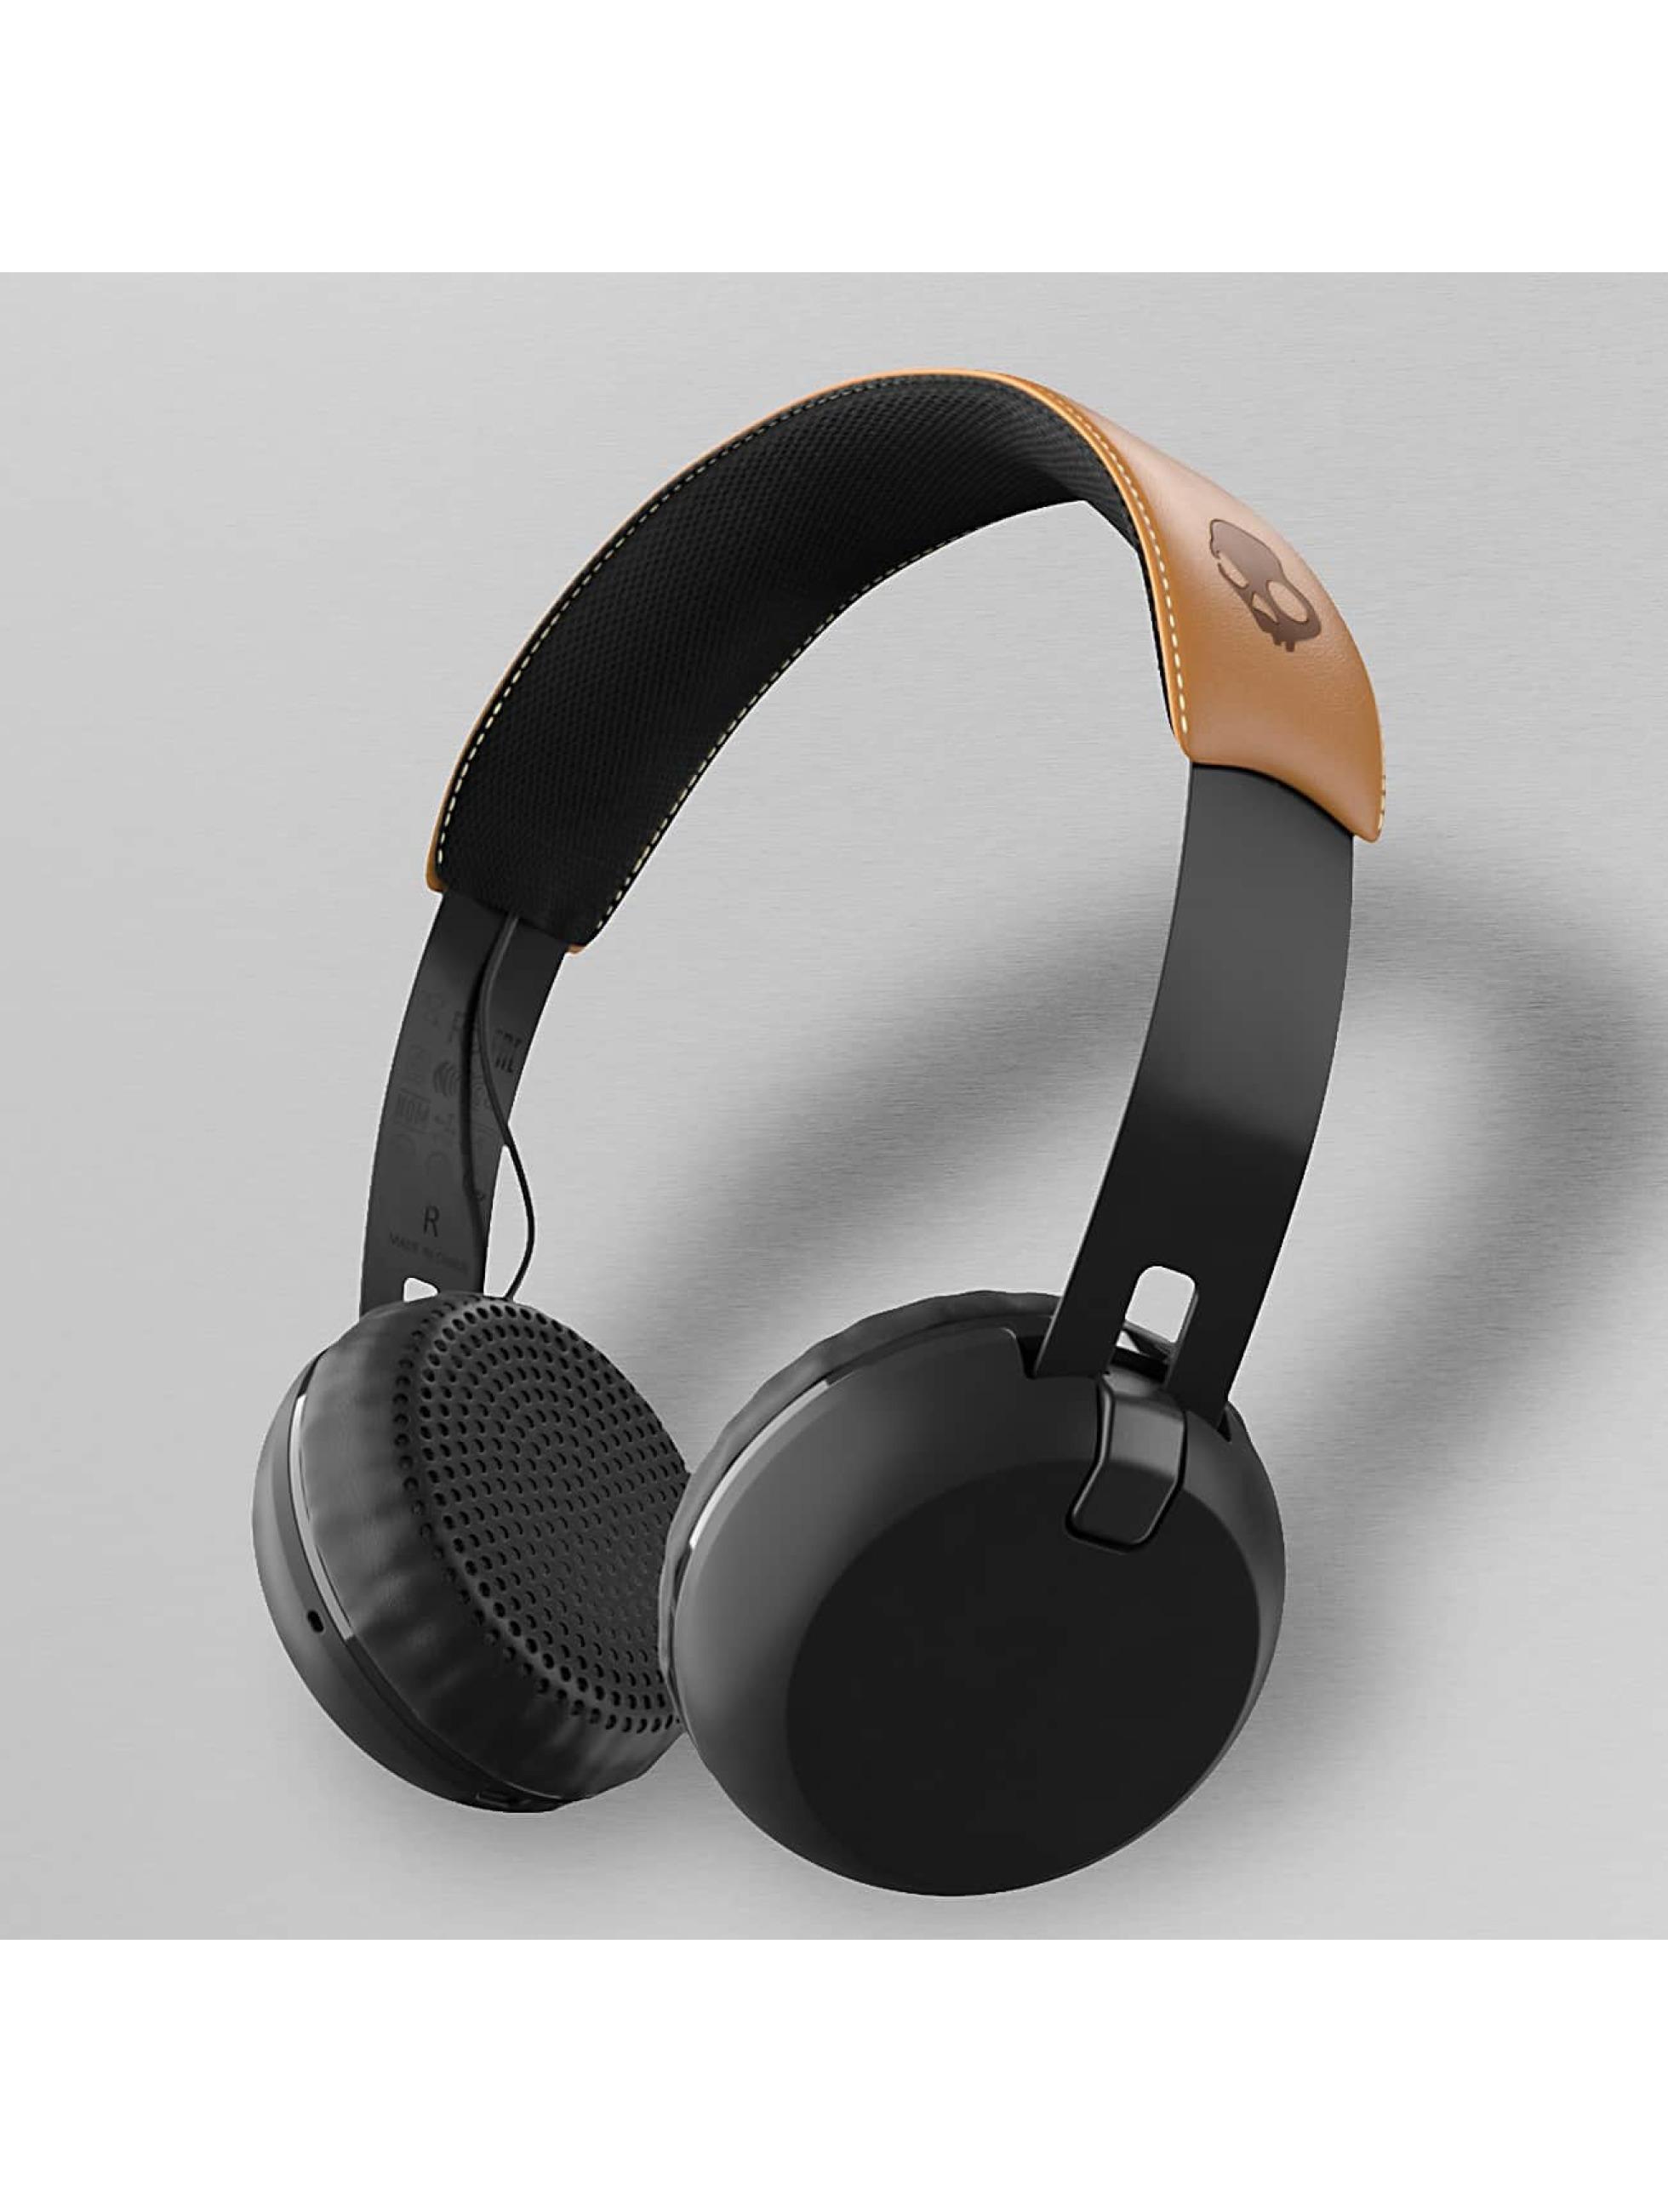 Skullcandy Männer,Frauen Kopfhörer Grind Wireless On Ear in schwarz